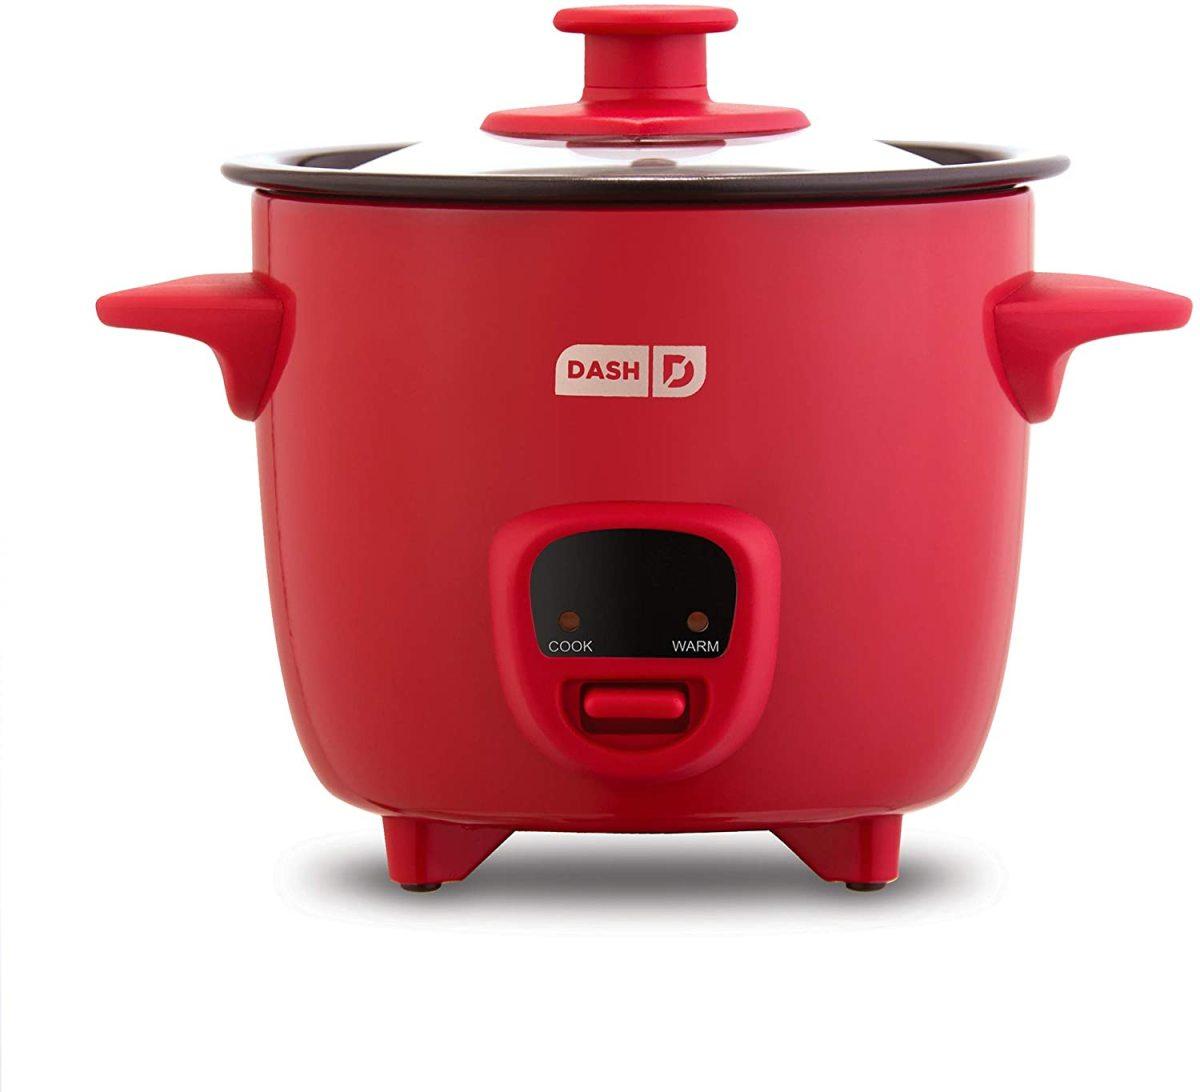 The Dash DRCM200GBRD04 Mini Rice Cooker Steamer.